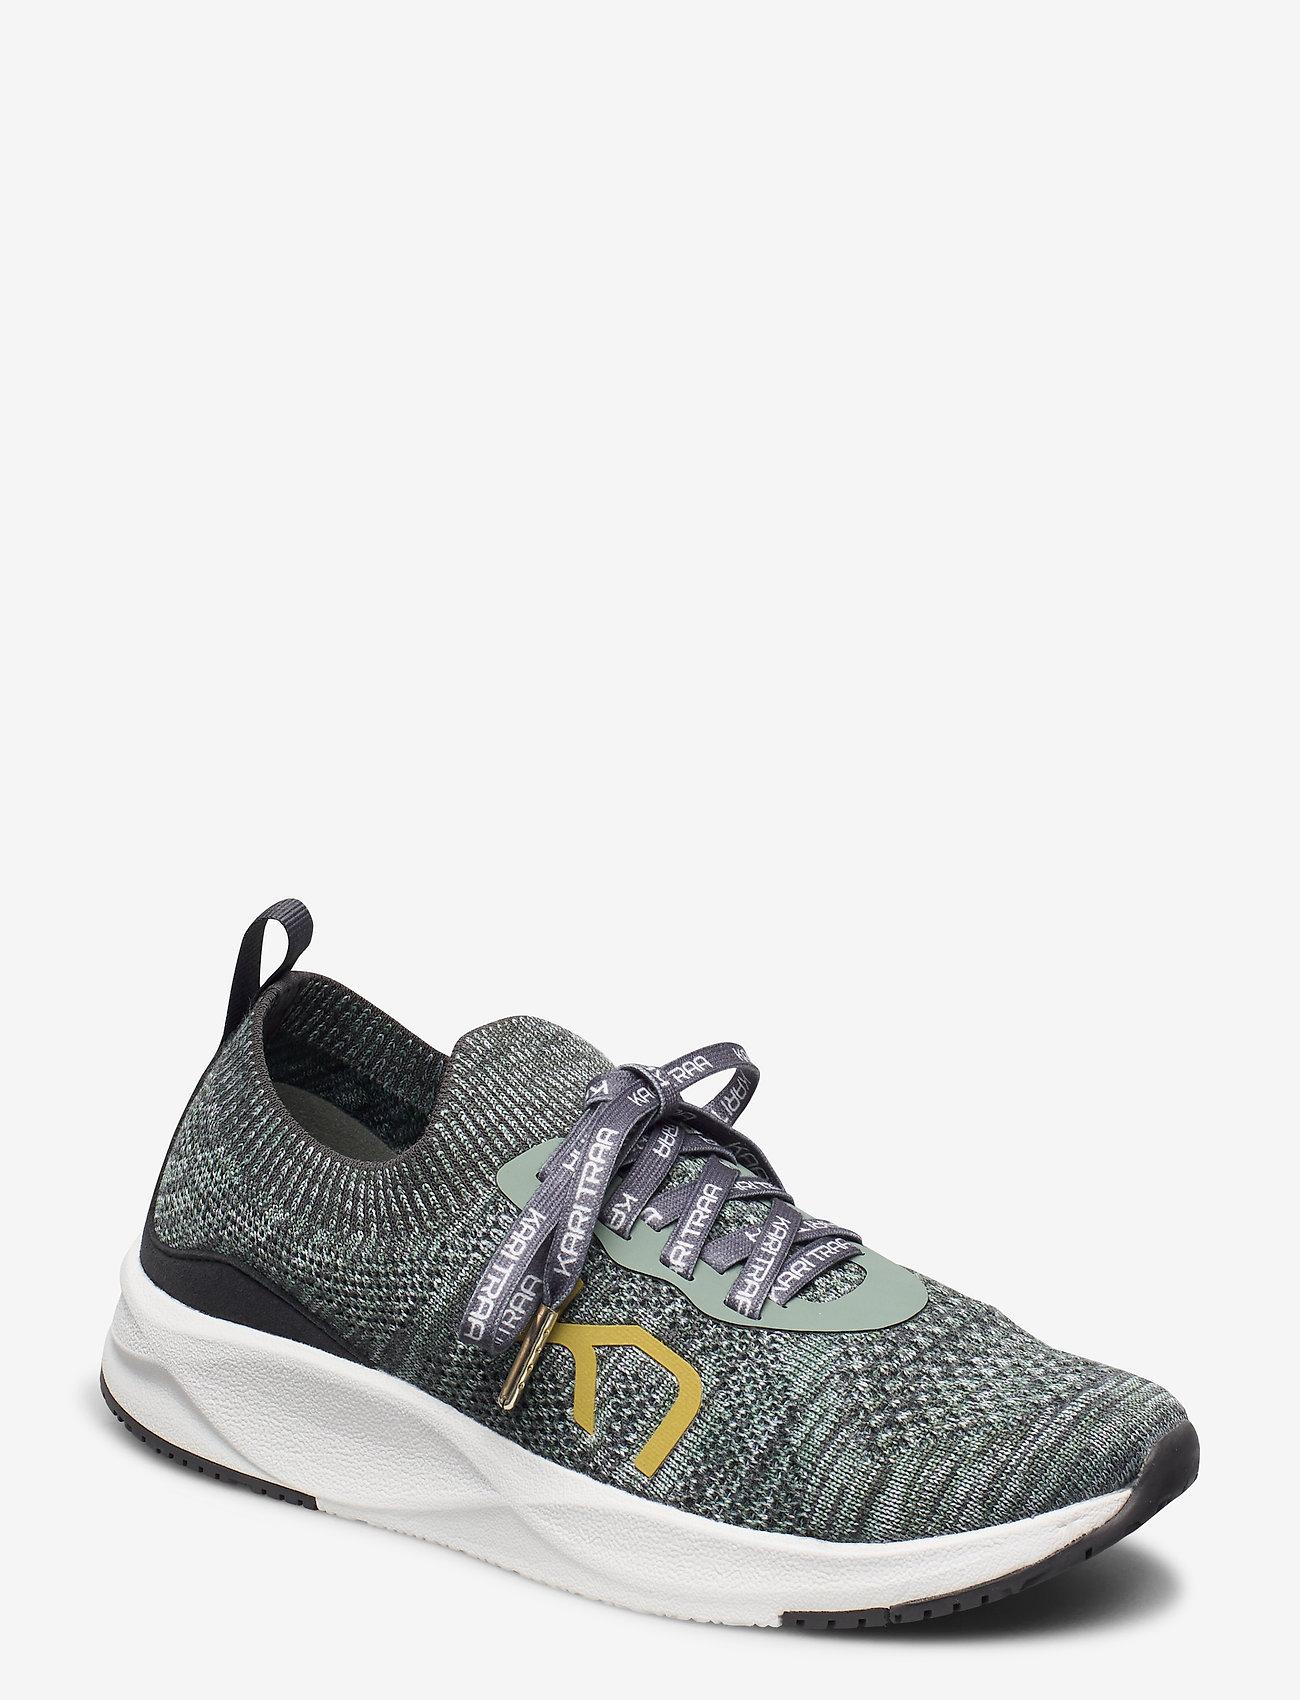 Kari Traa - BYKS - låga sneakers - thyme - 0